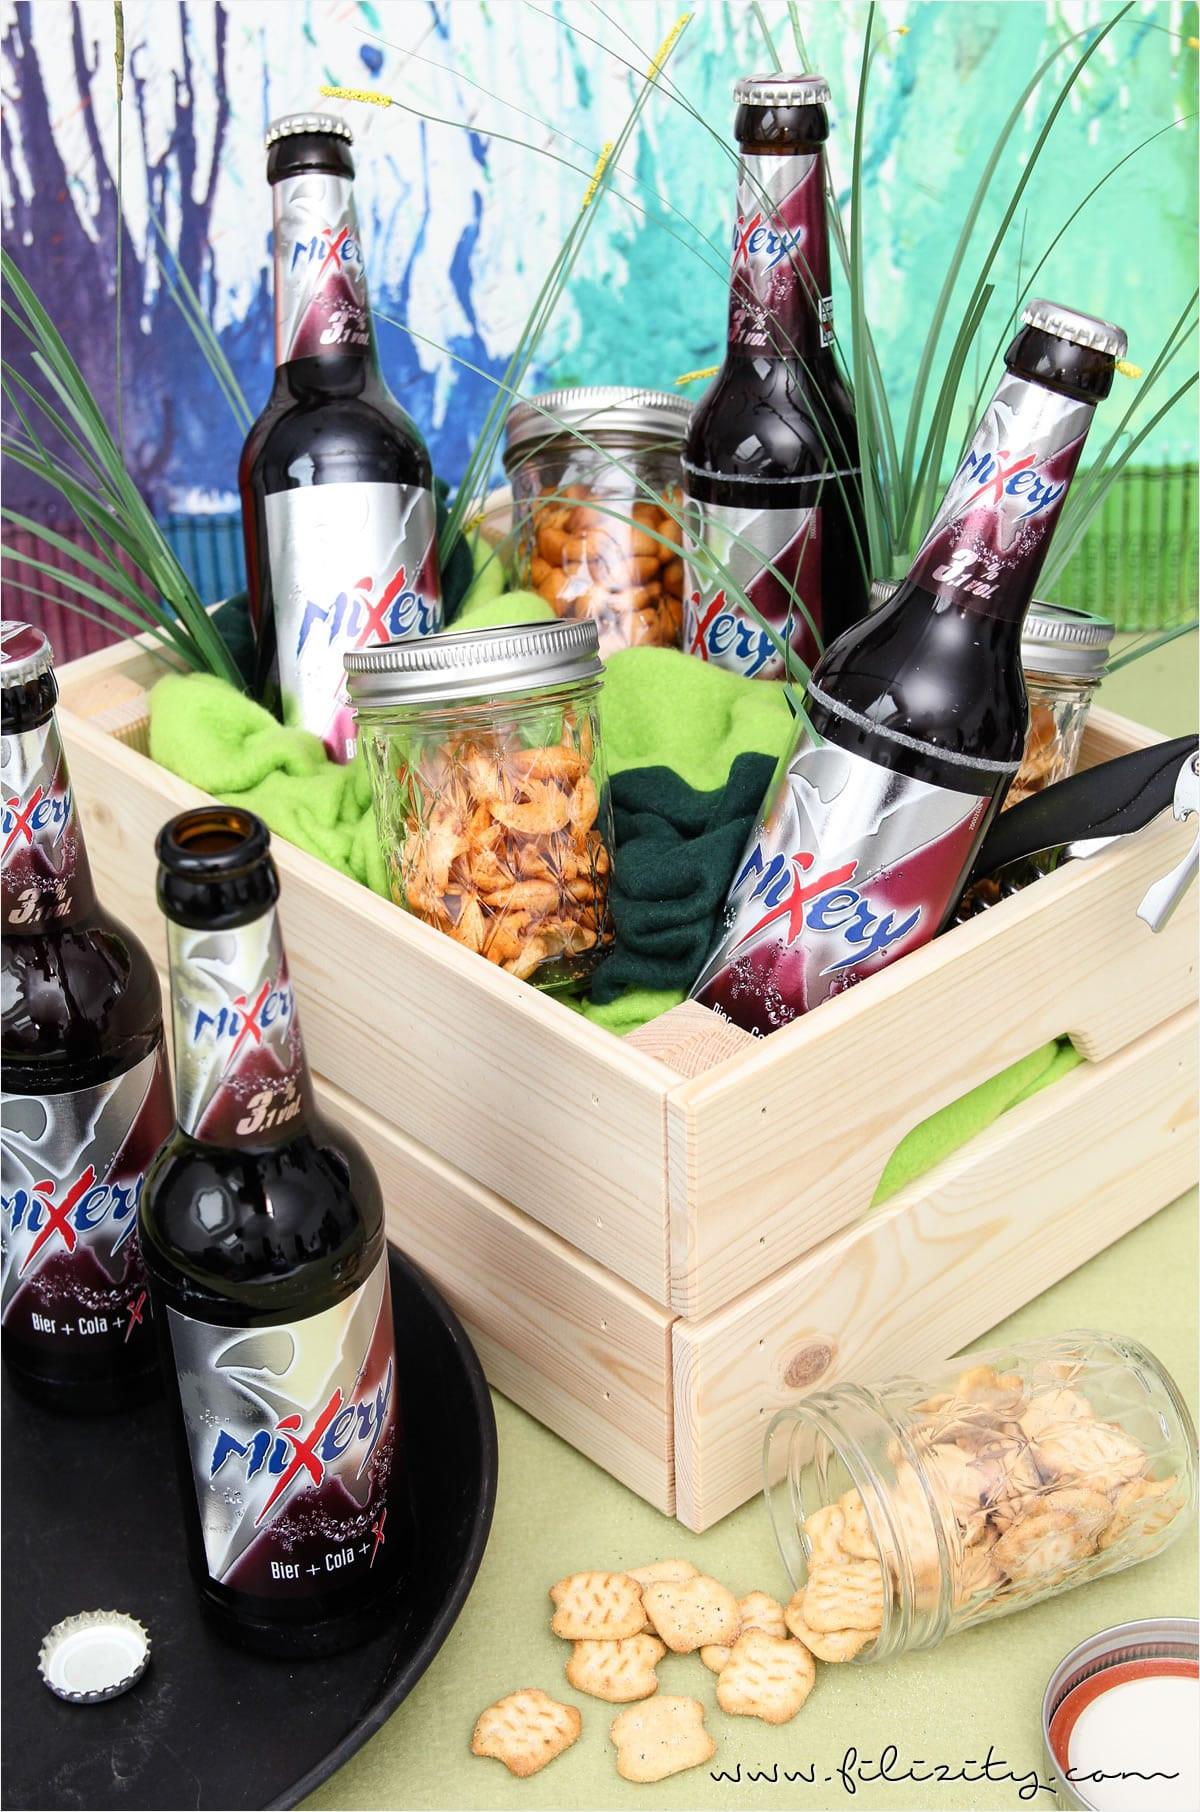 Bier Geschenke Selber Machen  Biergarten Last Minute Geschenk zum Vatertag HANDMADE